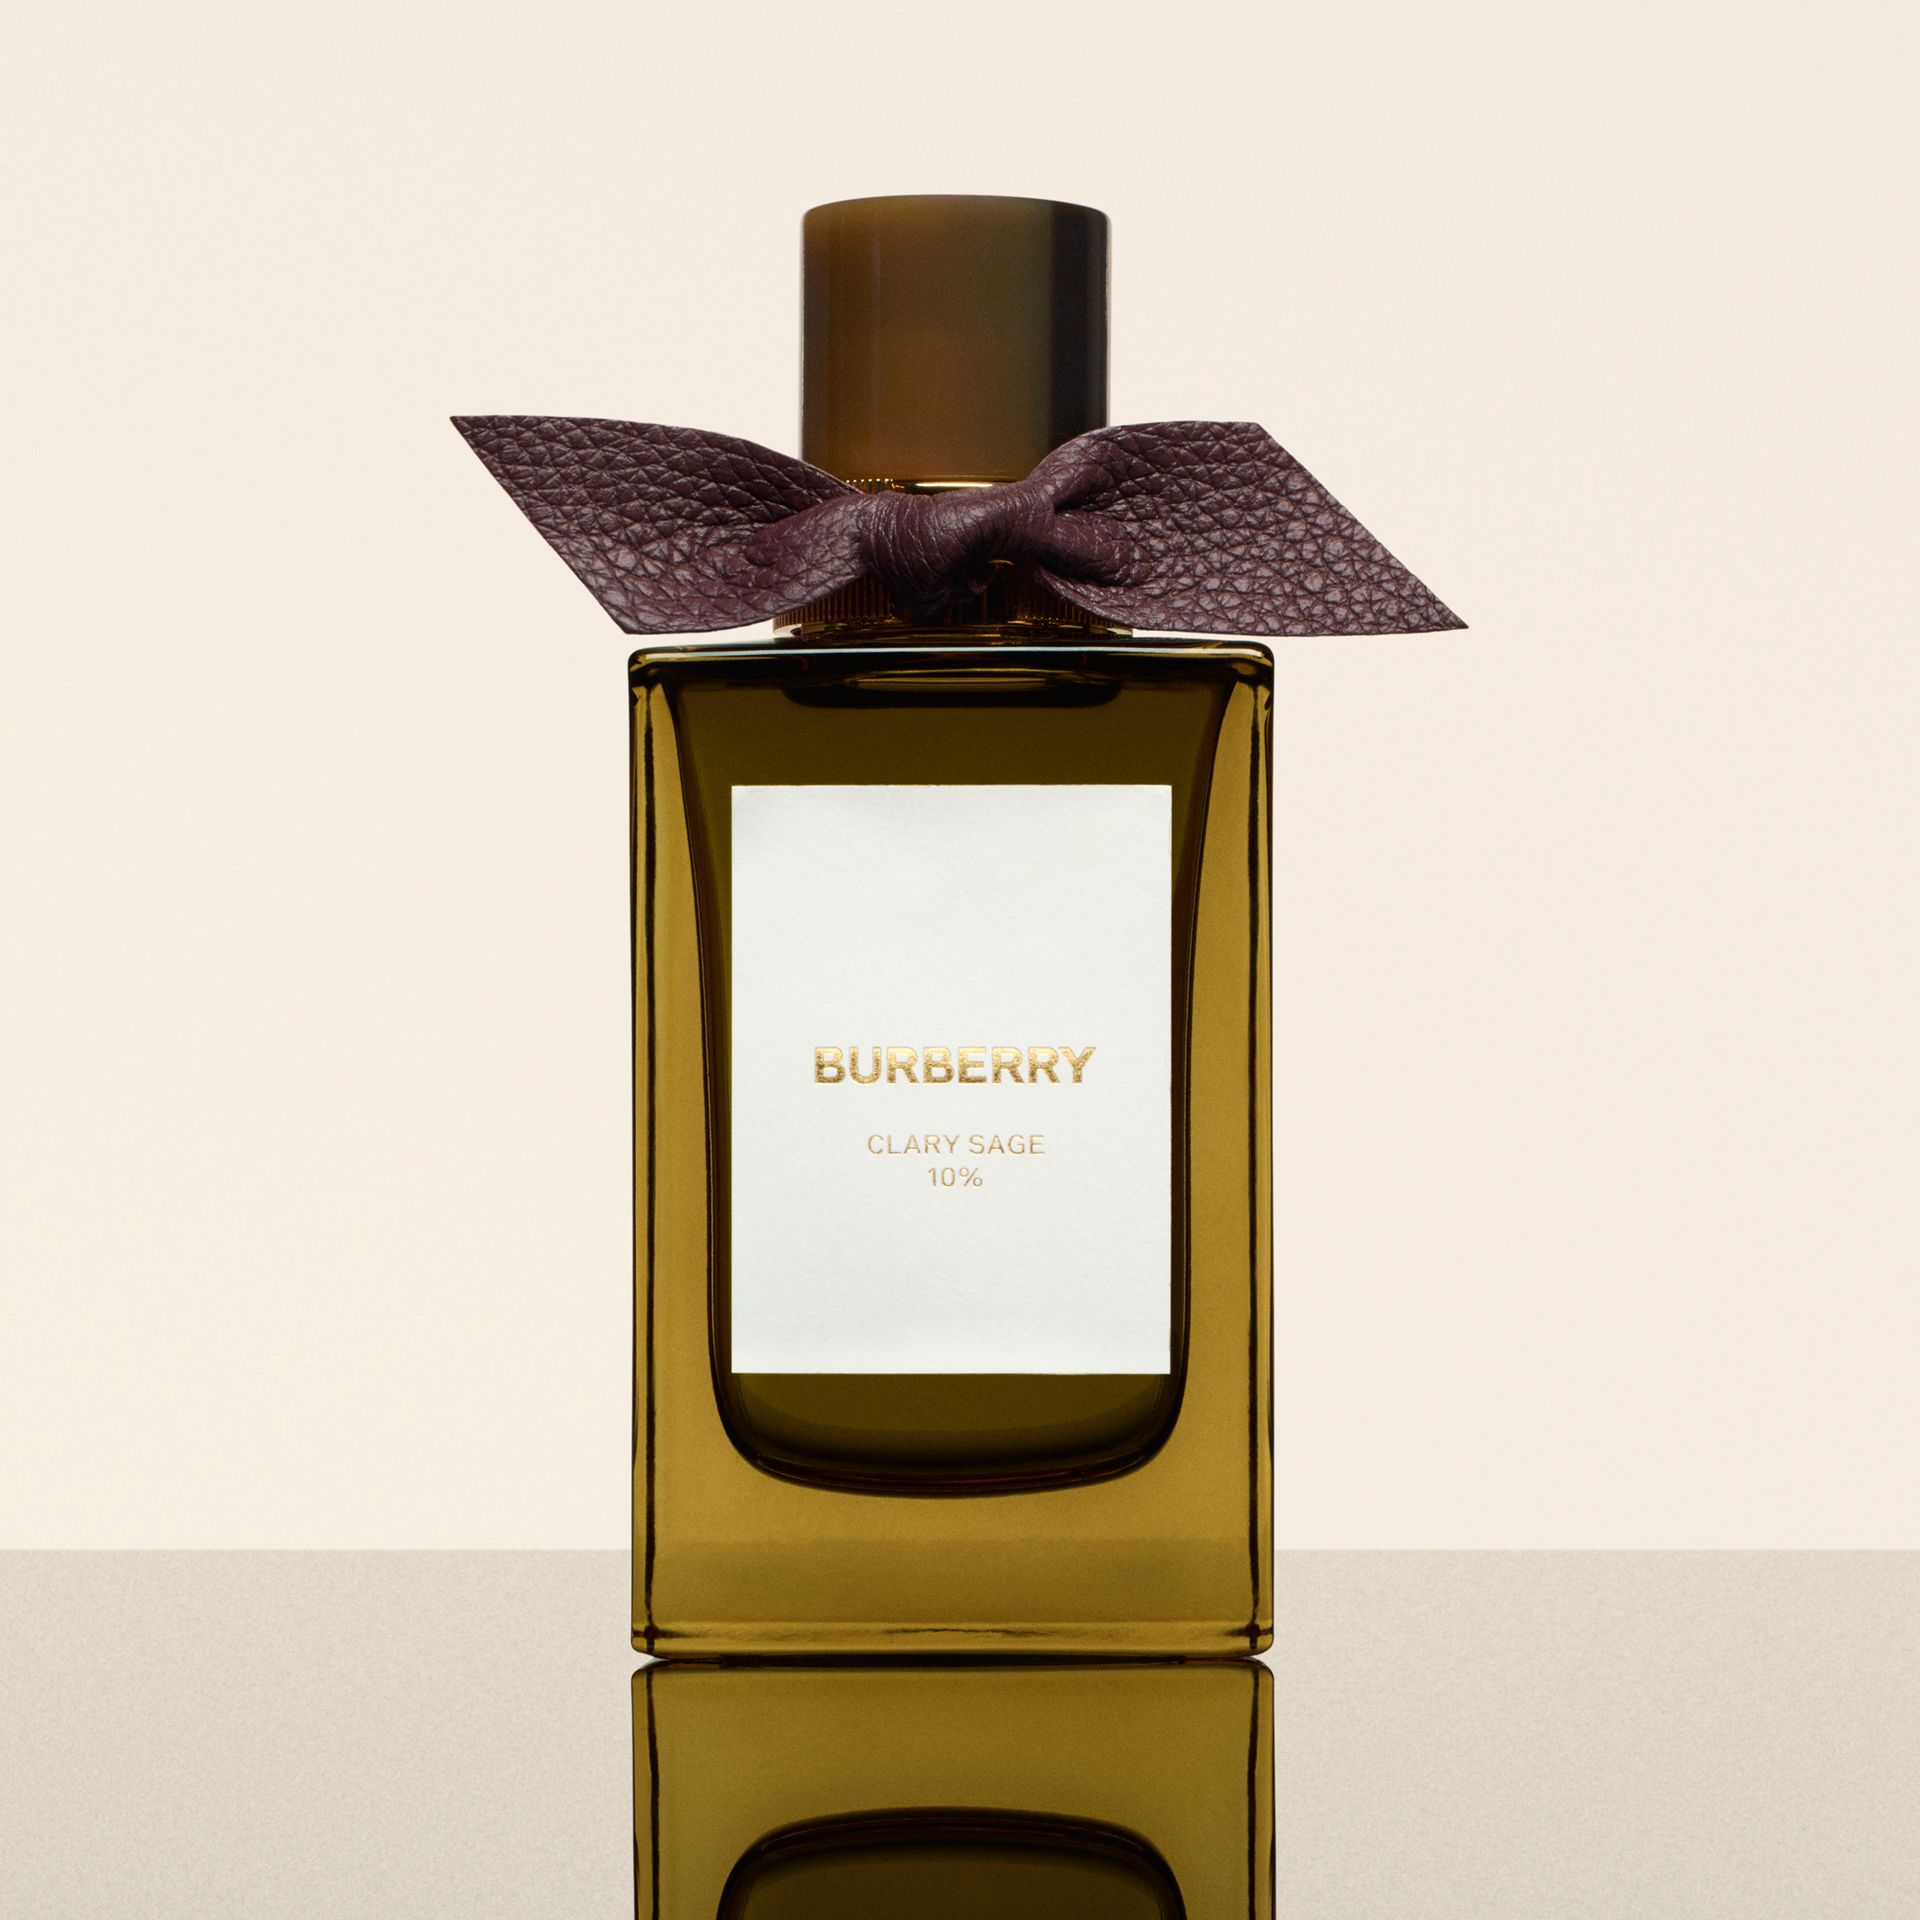 Icône Burberry: Eau de Parfum ClarySage 100ml | Burberry - photo de la galerie 1